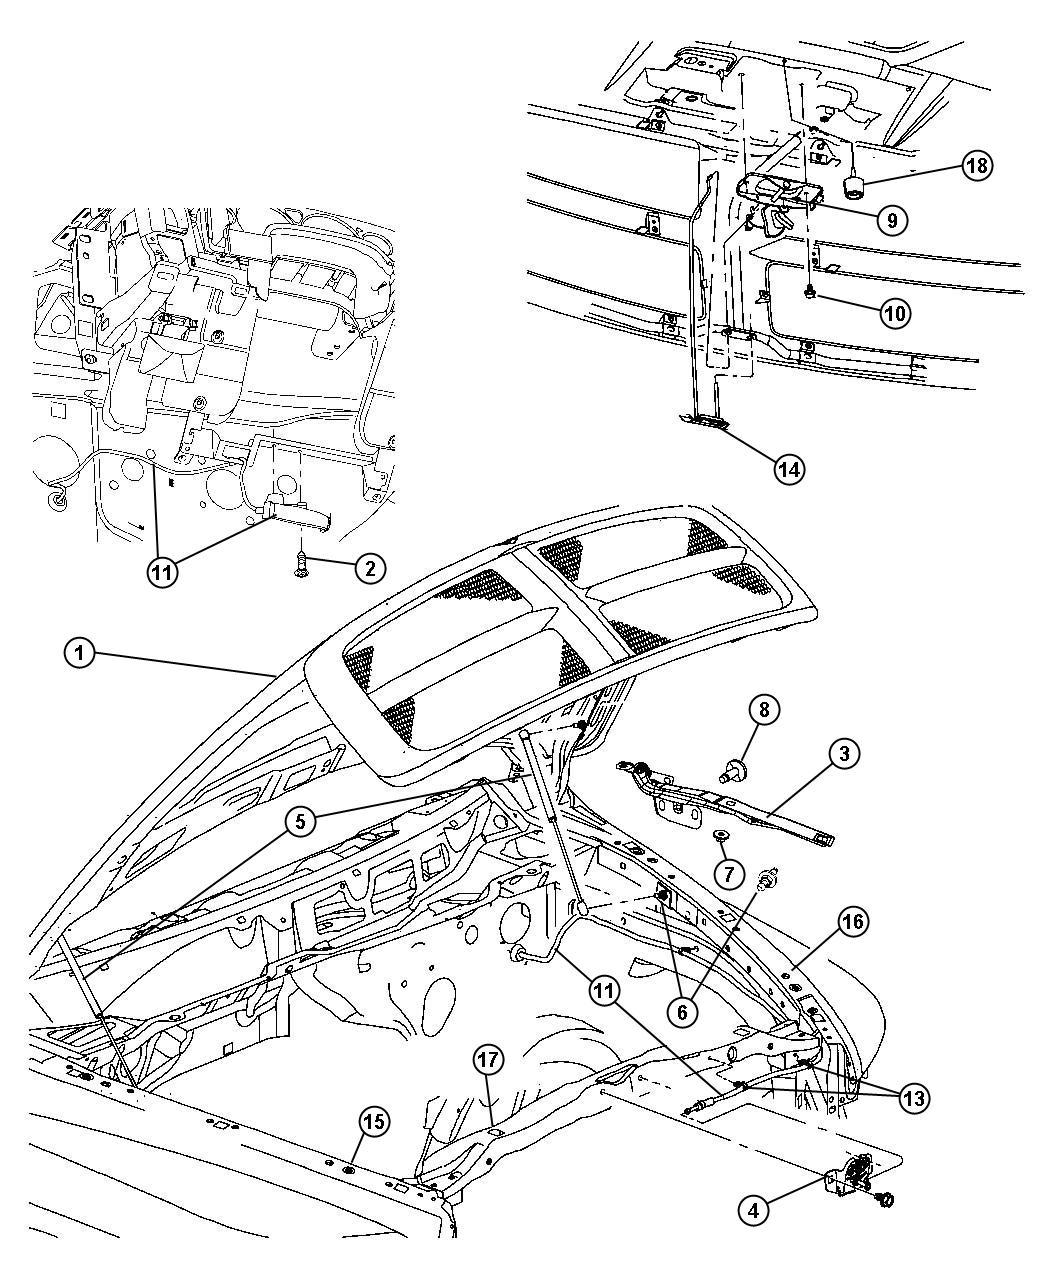 Dodge 4x4 Front Suspension Diagram